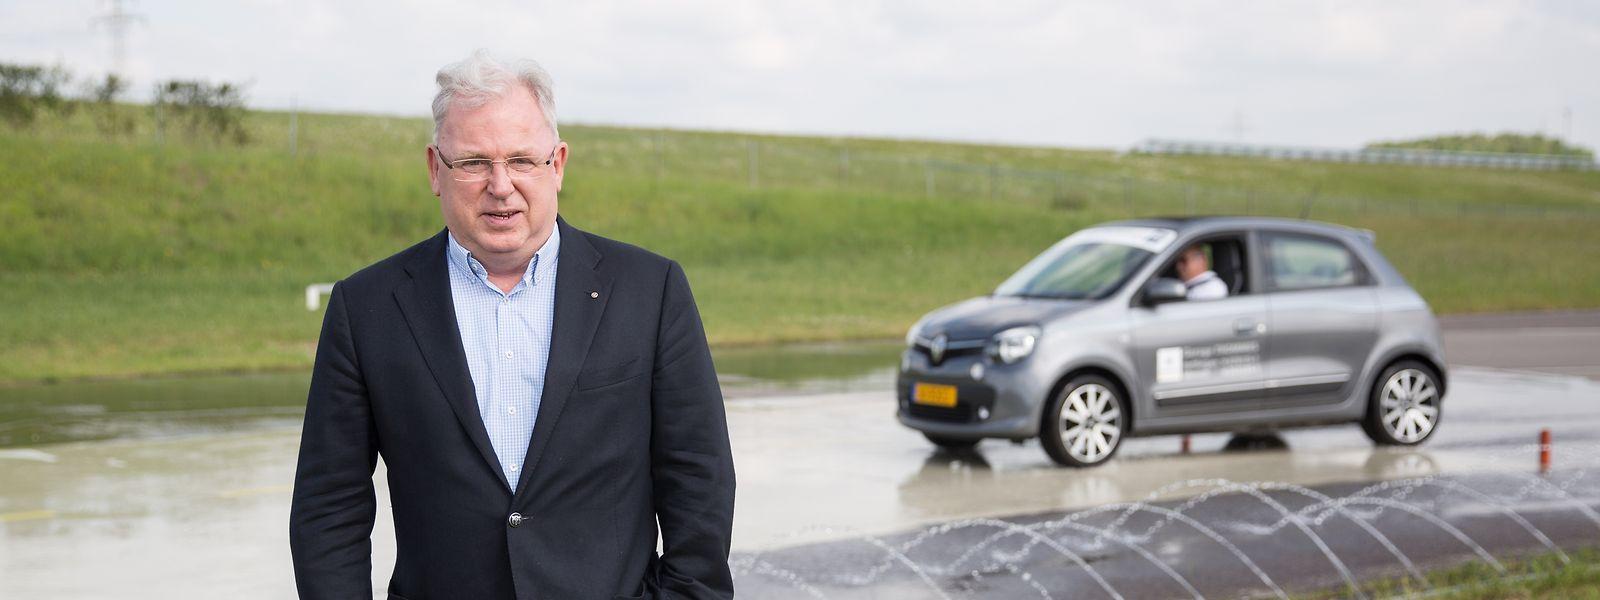 Marc Pannacci, Direktor des Fahrsicherheitszentrums, geht am 10. Juni in Rente.